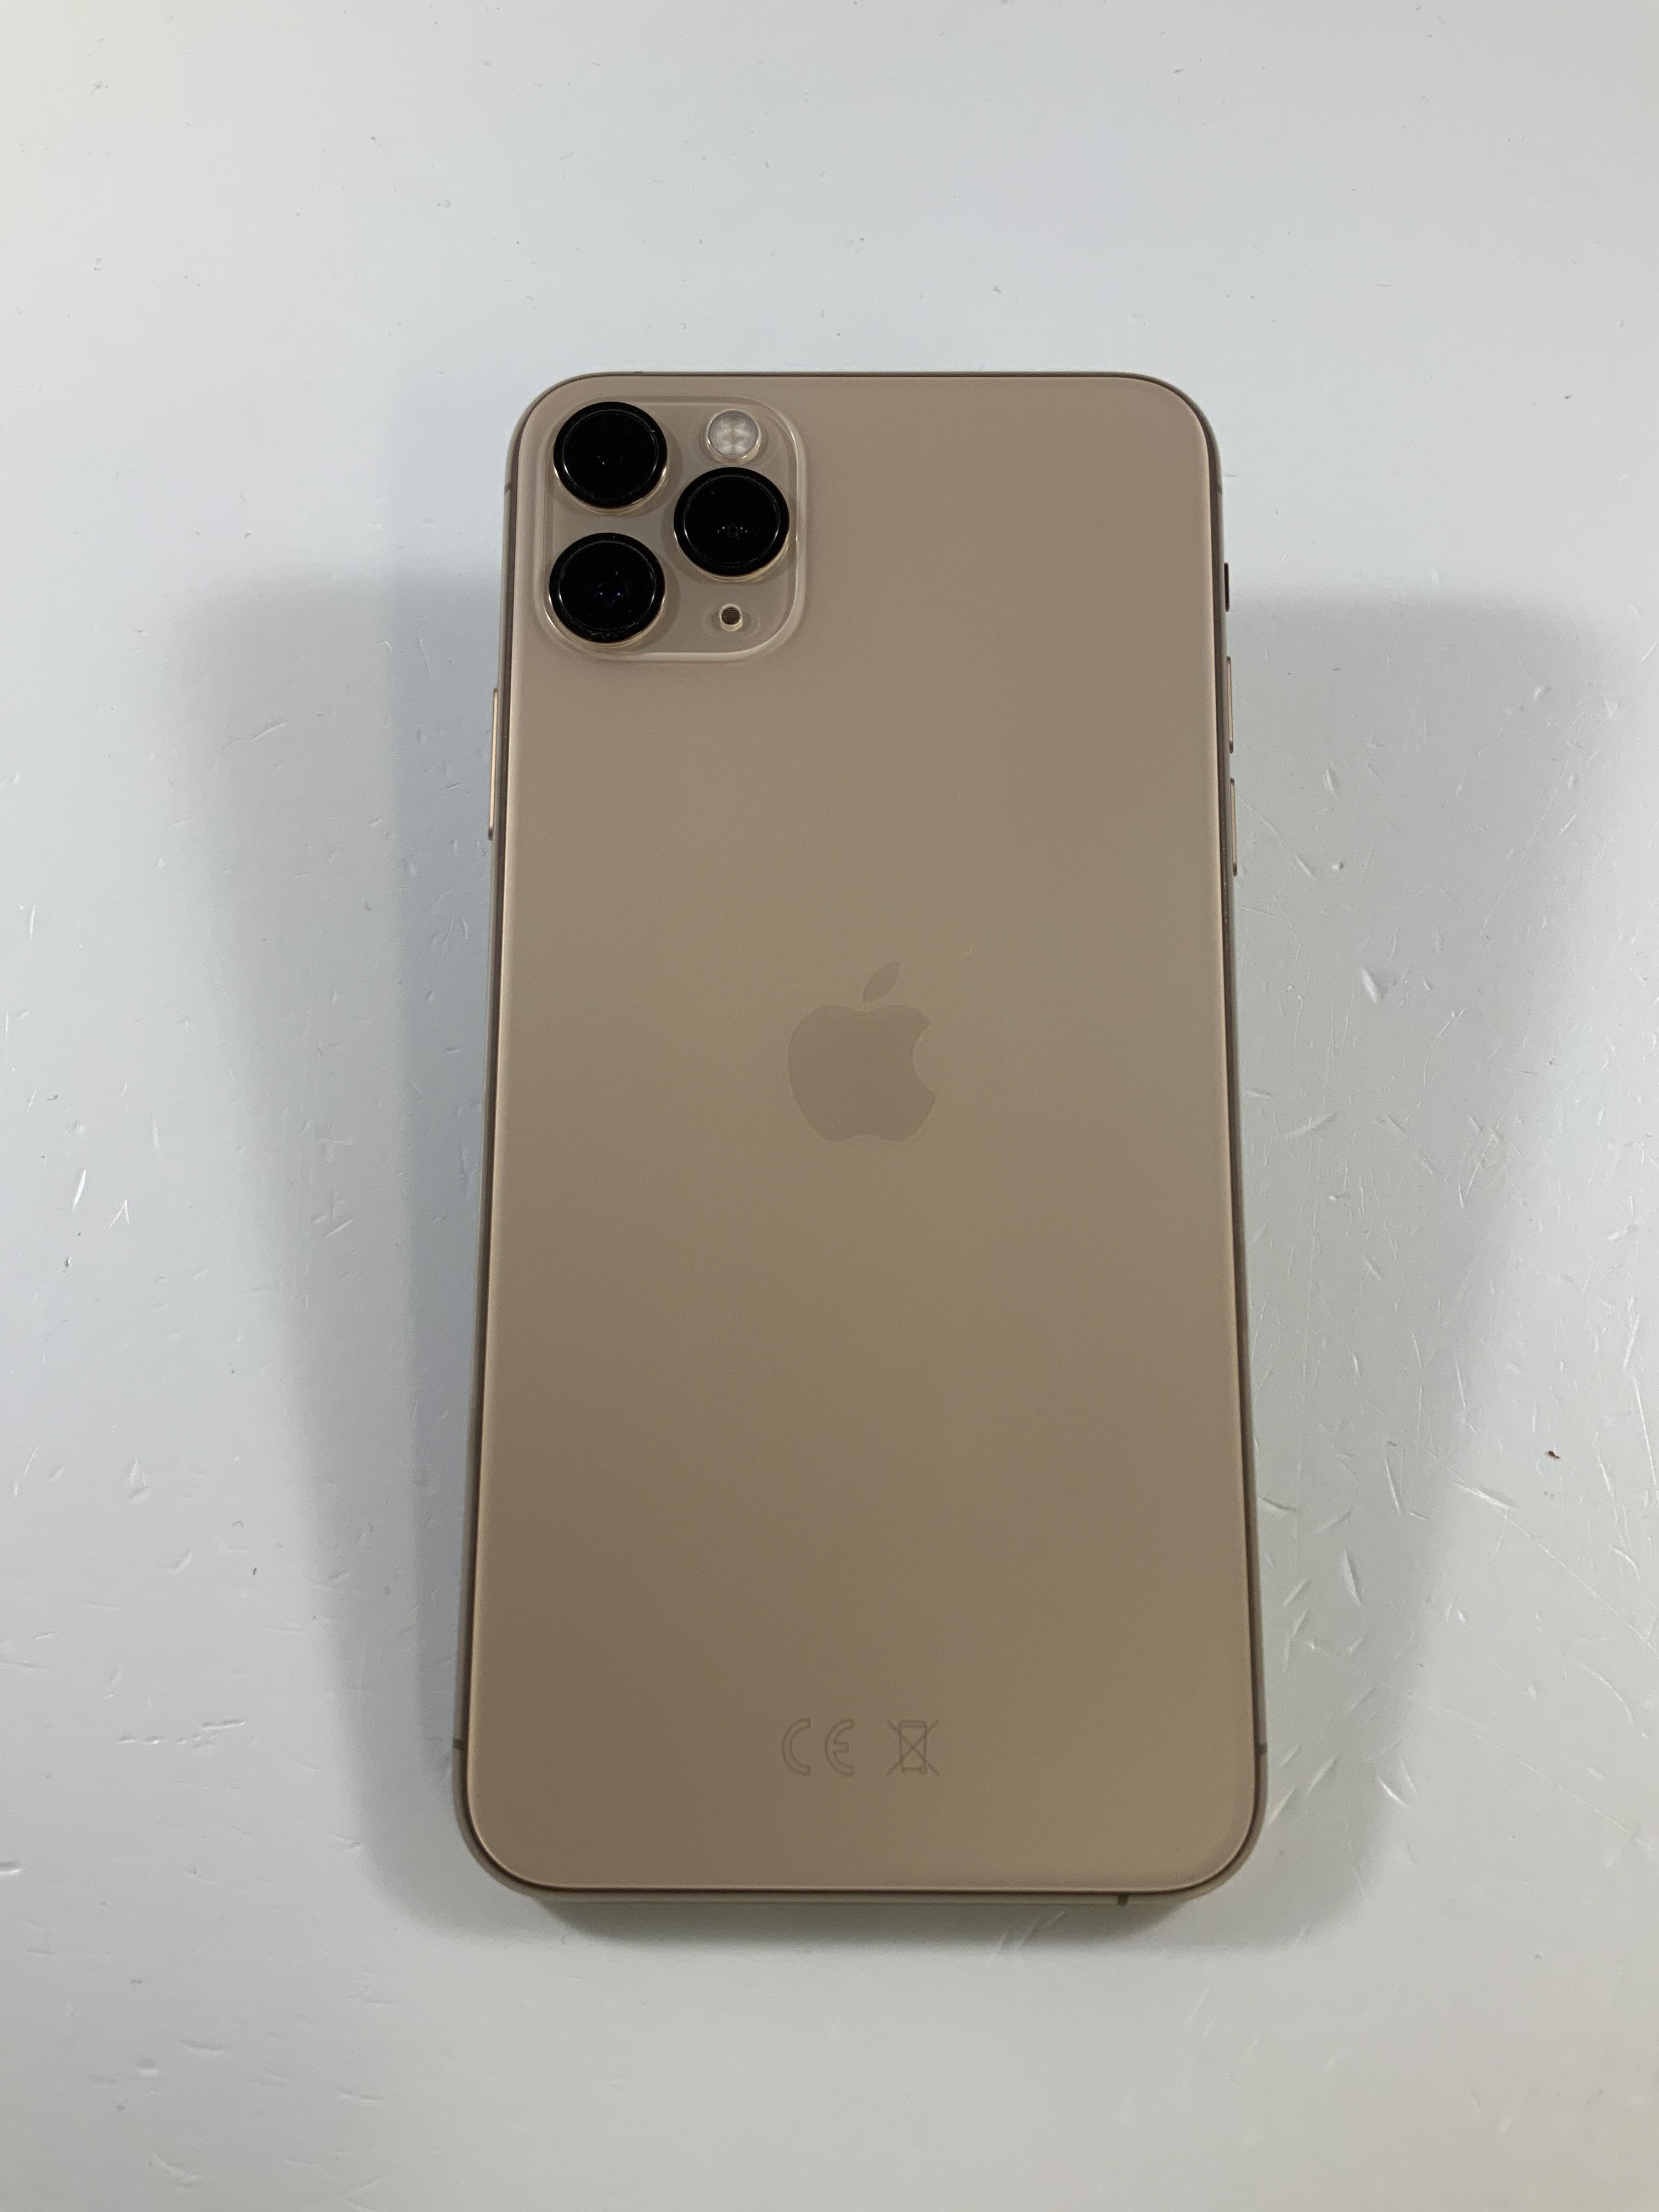 iPhone 11 Pro Max 256GB, 256GB, Gold, Bild 2